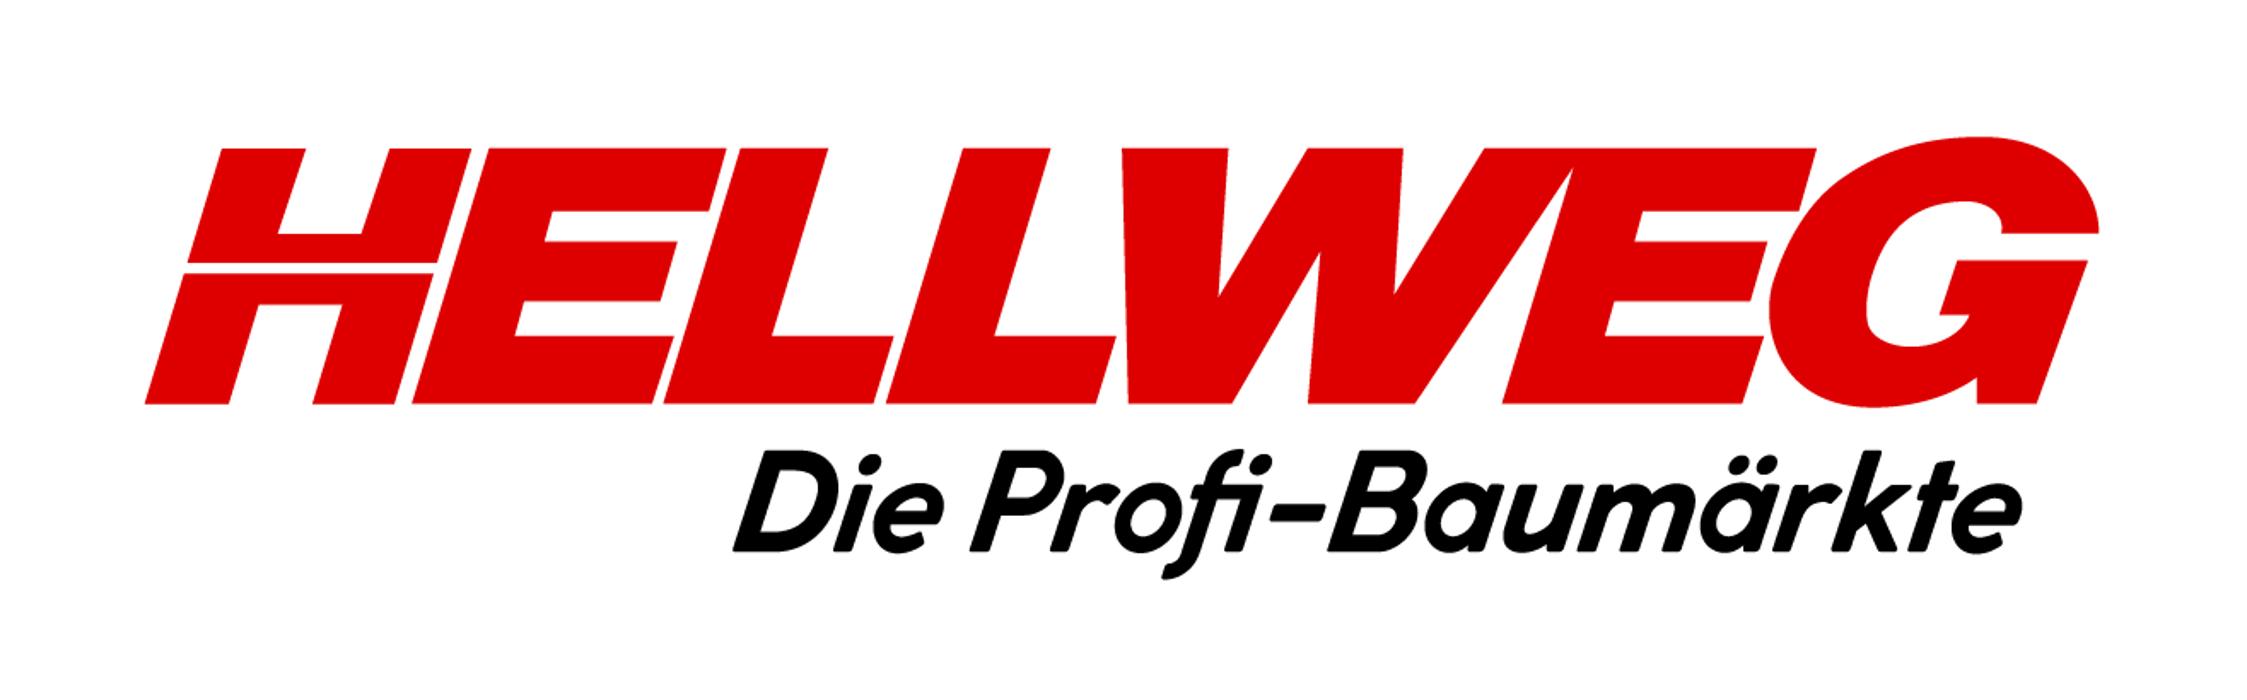 Bild zu HELLWEG - Die Profi-Baumärkte Osnabrück in Osnabrück